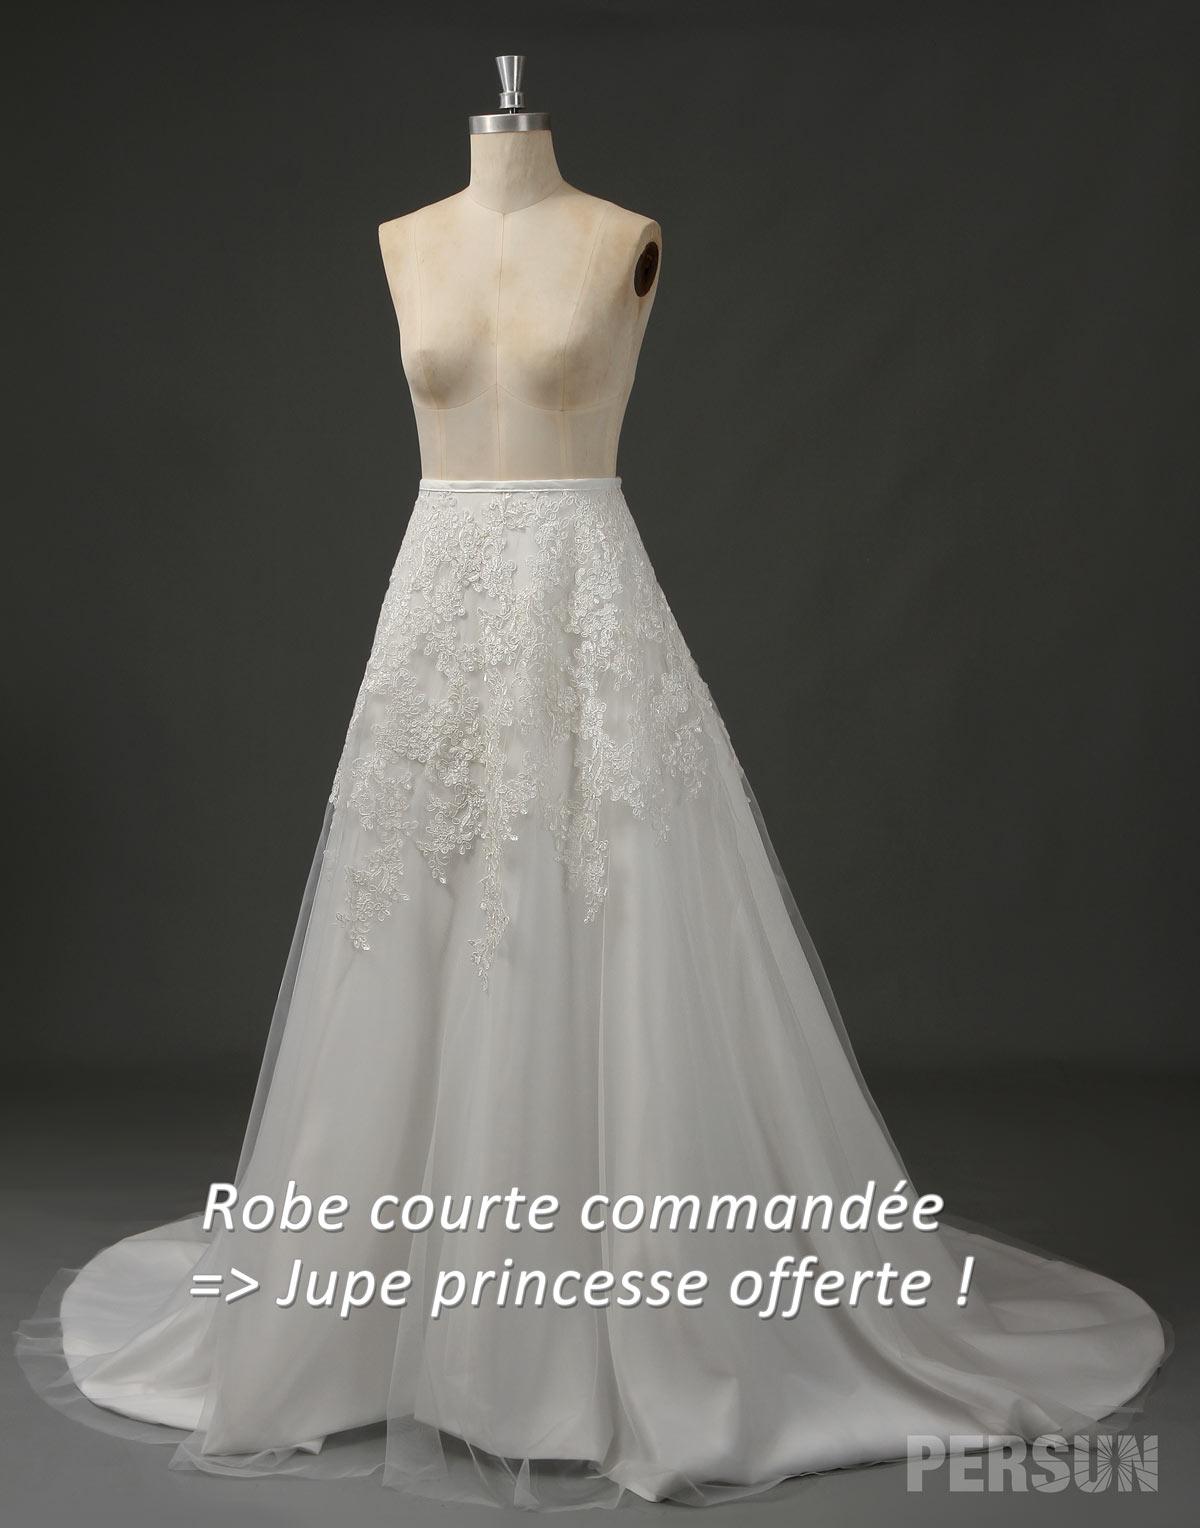 jupe princesse appliquée offerte si robe courte commandée